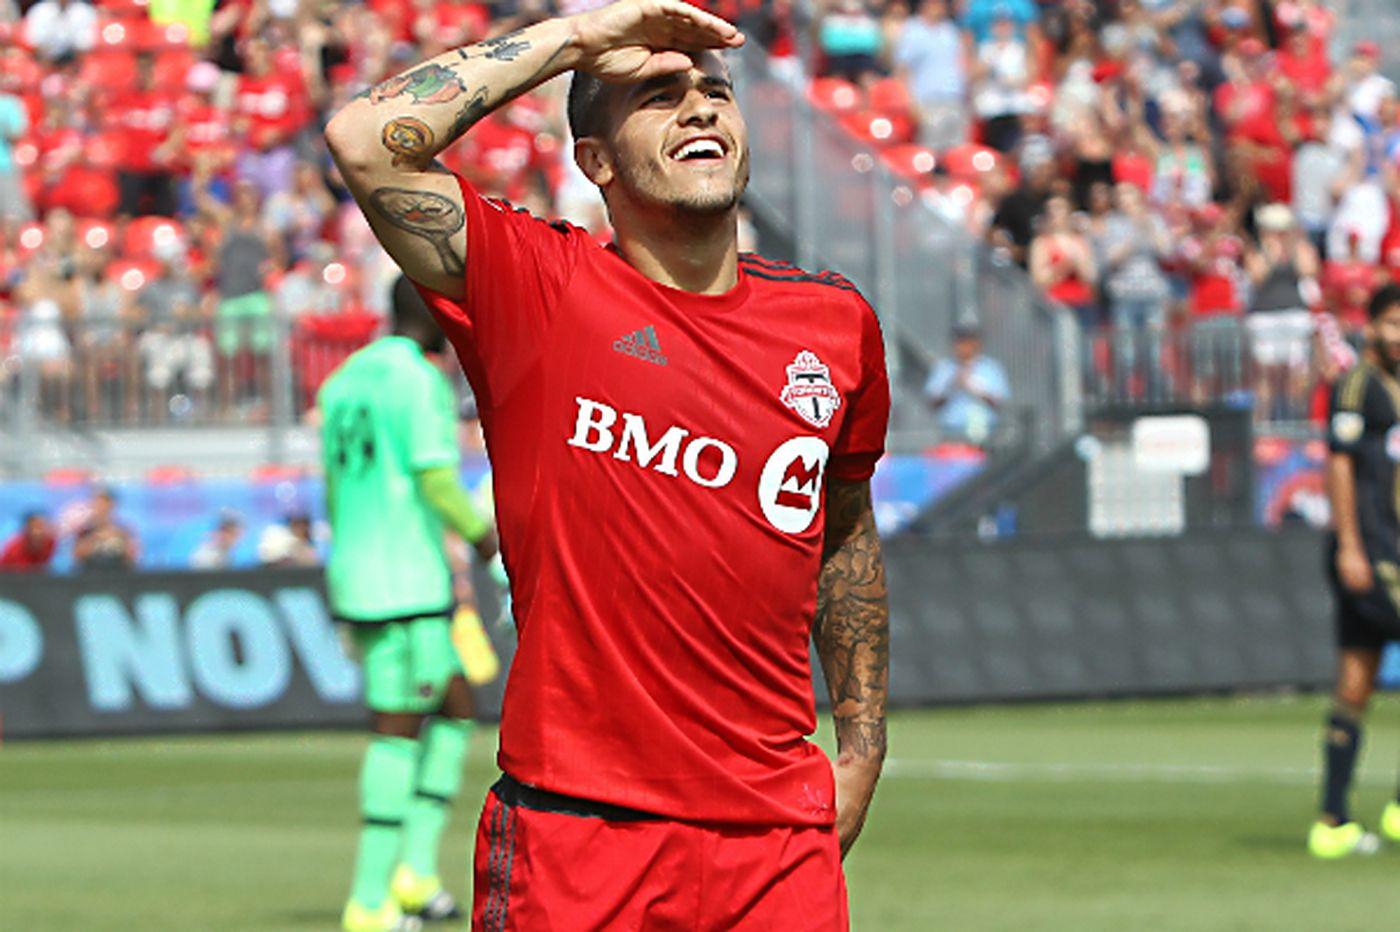 Union fall to Sebastian Giovinco and Toronto FC, 2-1